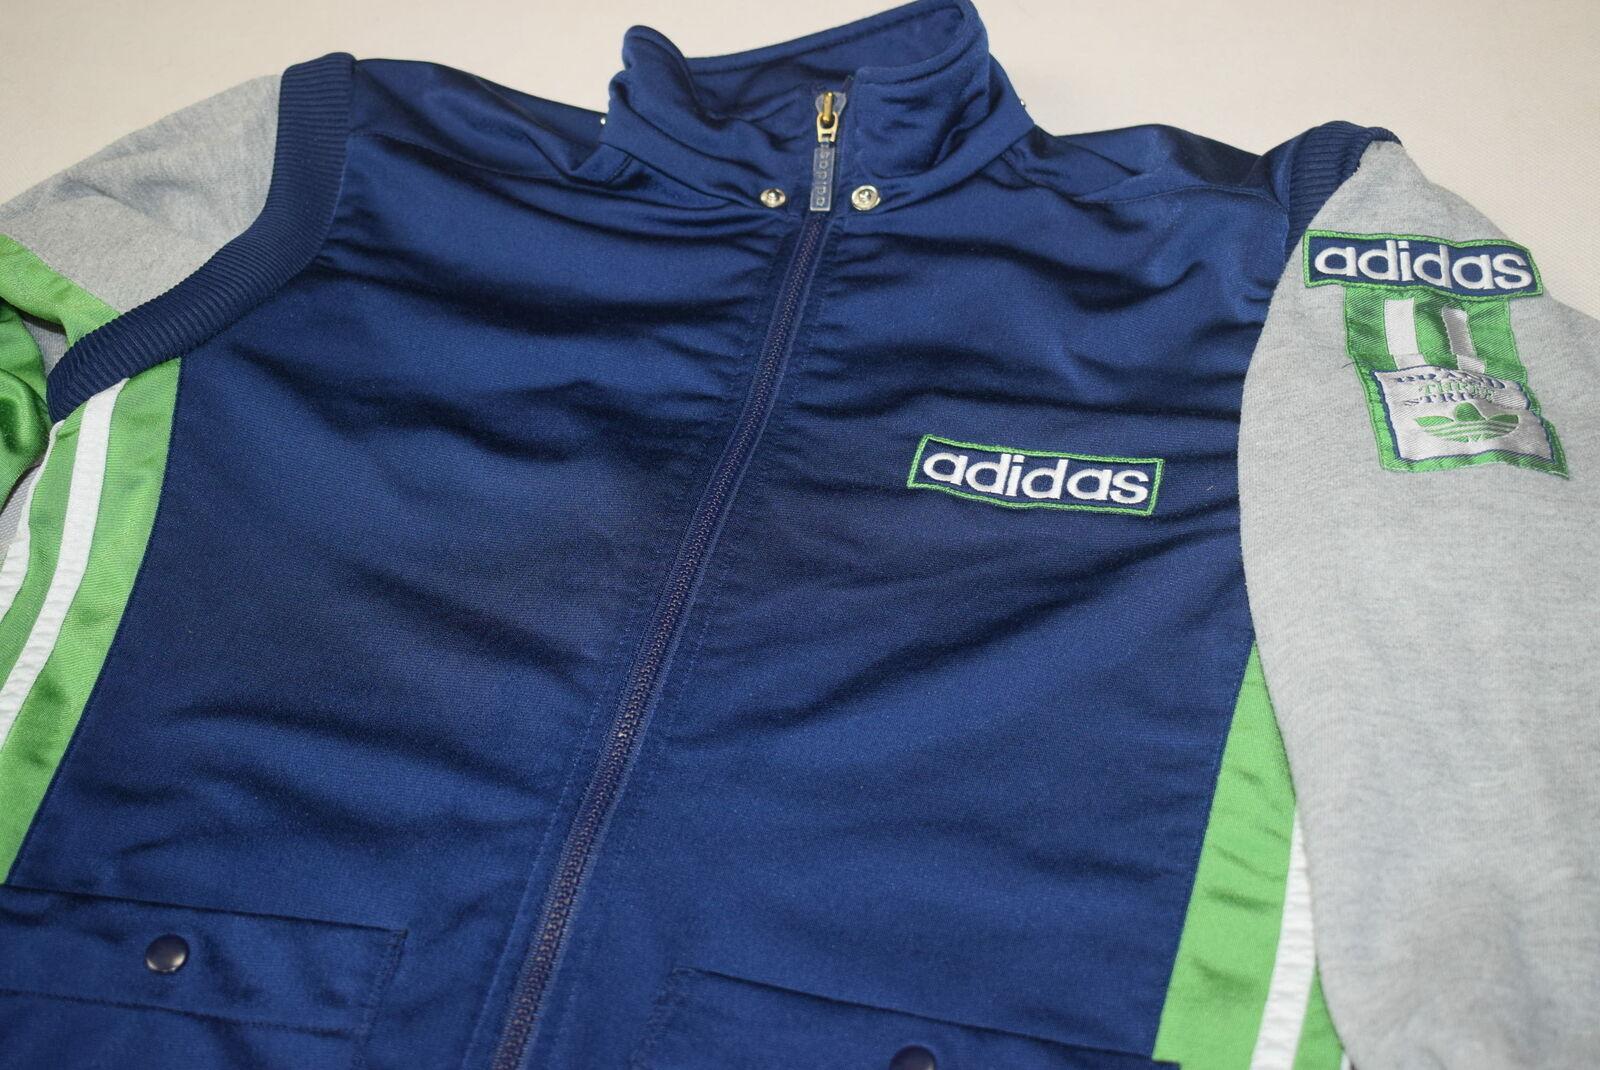 Adidas Originals Training Jacket Sports Jacket Track Top